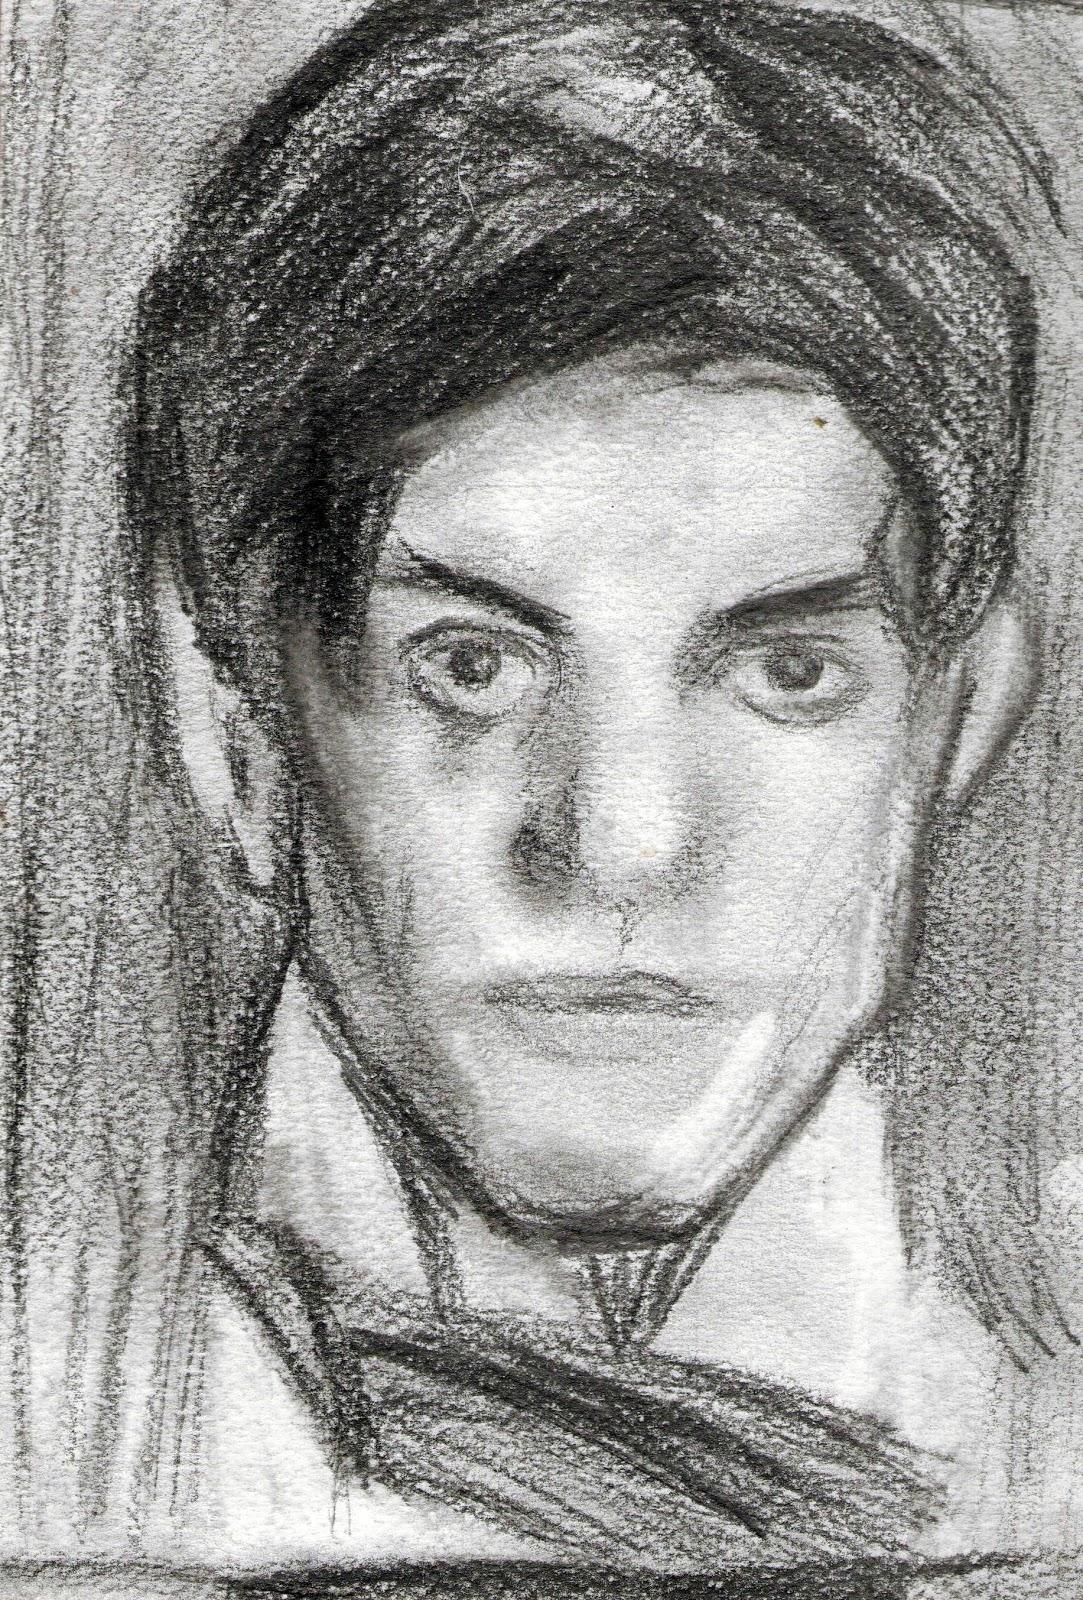 pablo picasso sketches - photo #44